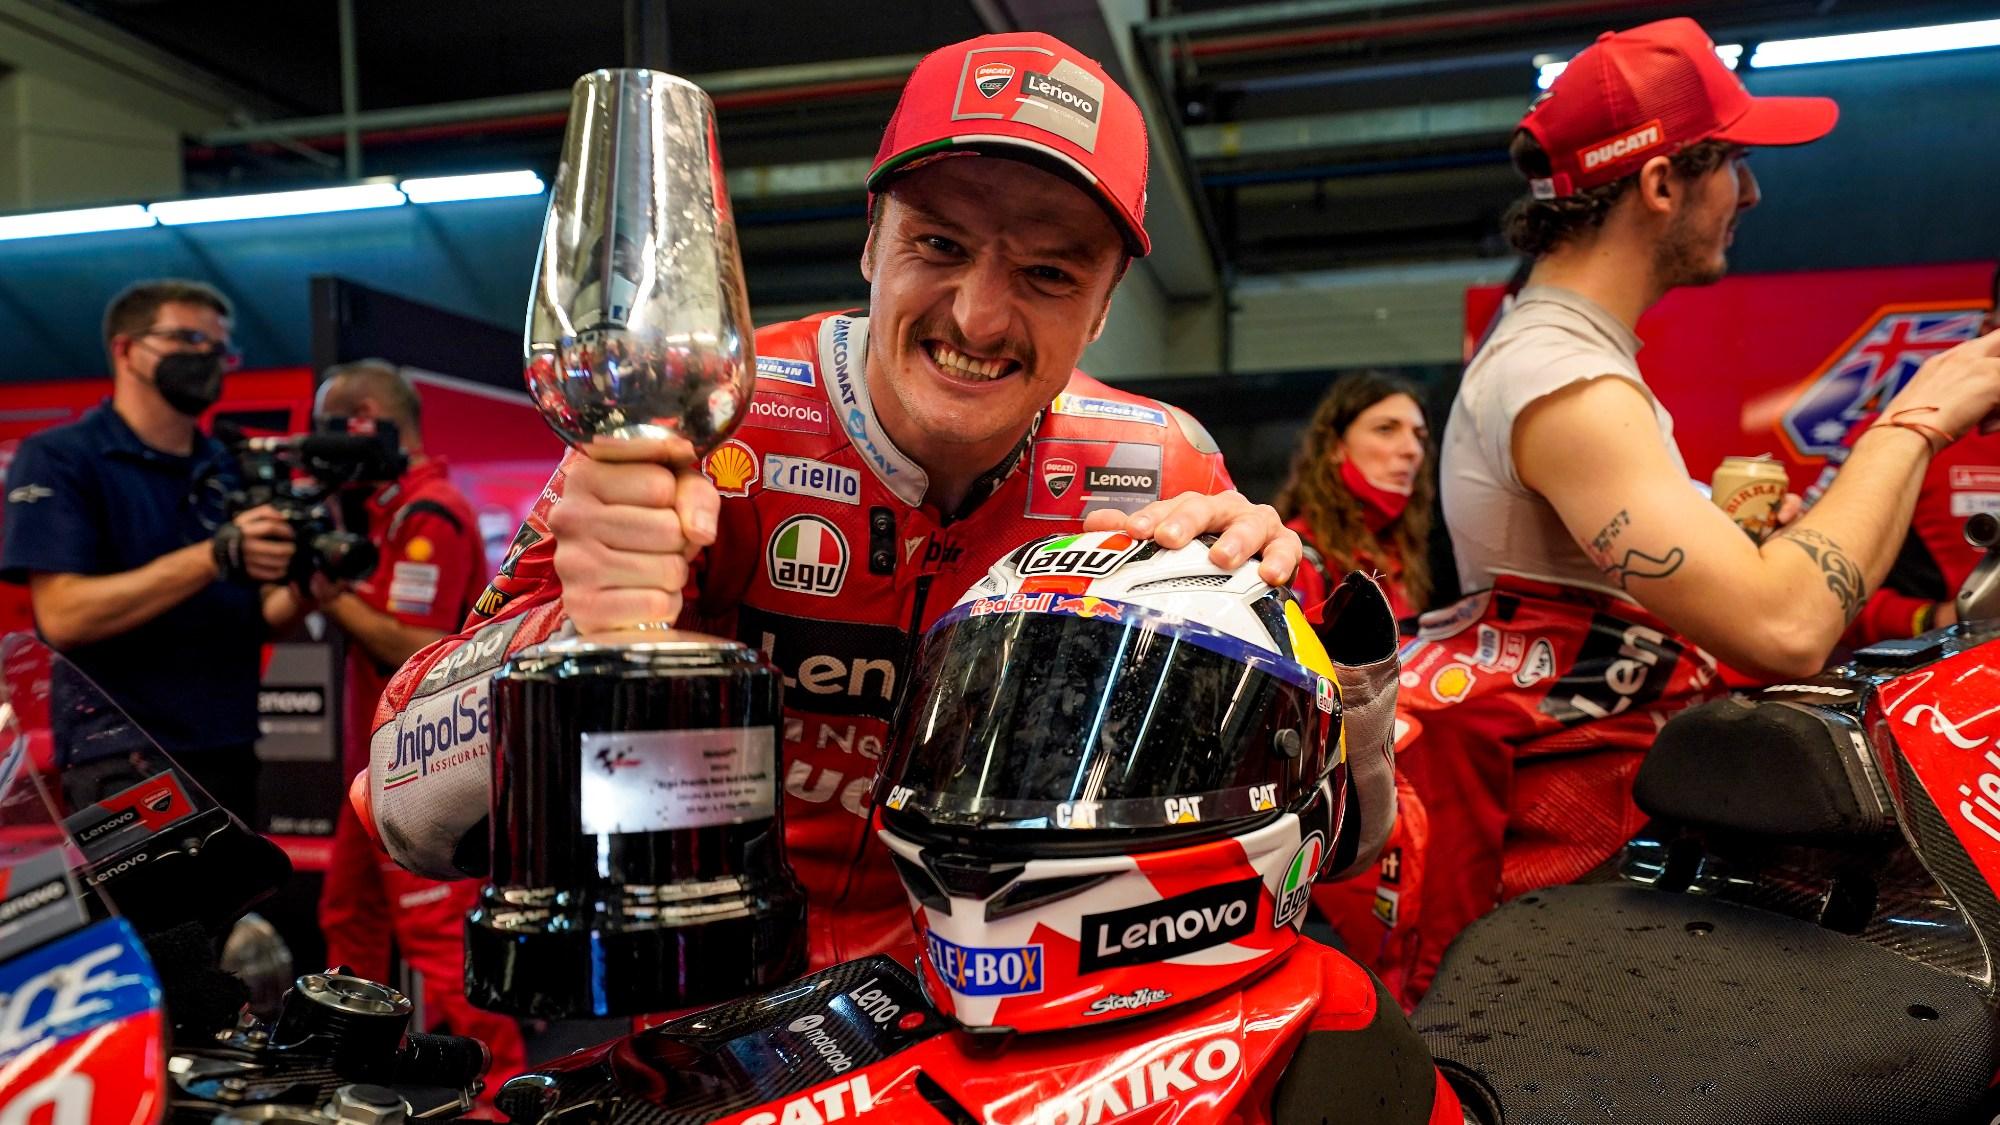 Jack Miller, 2021 Spanish MotoGP